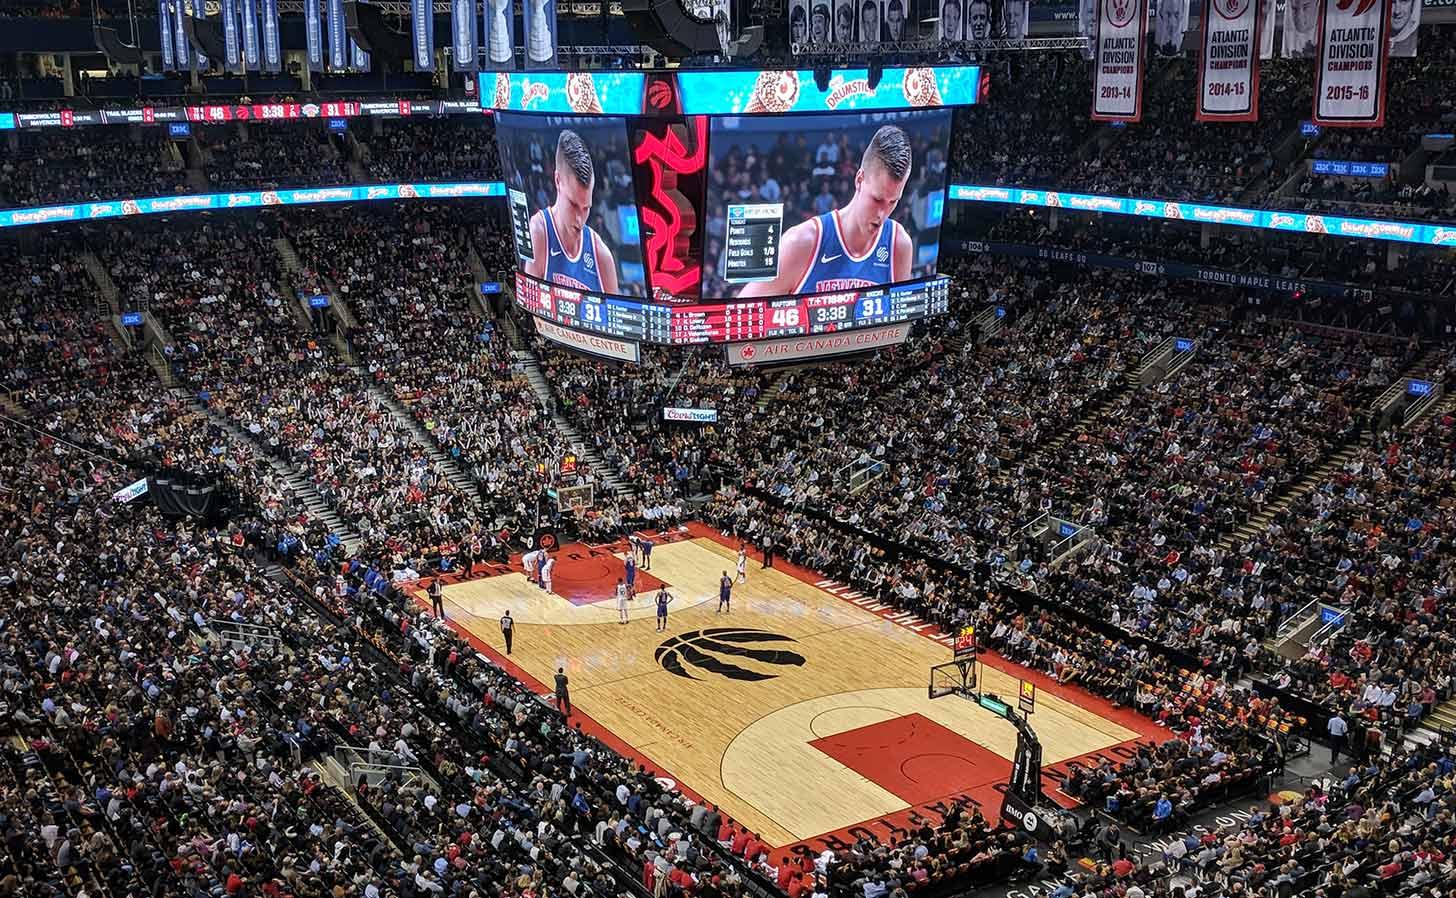 Nu kan du bli kommentator för basketmatcher. Foto: Ryan / Unsplash